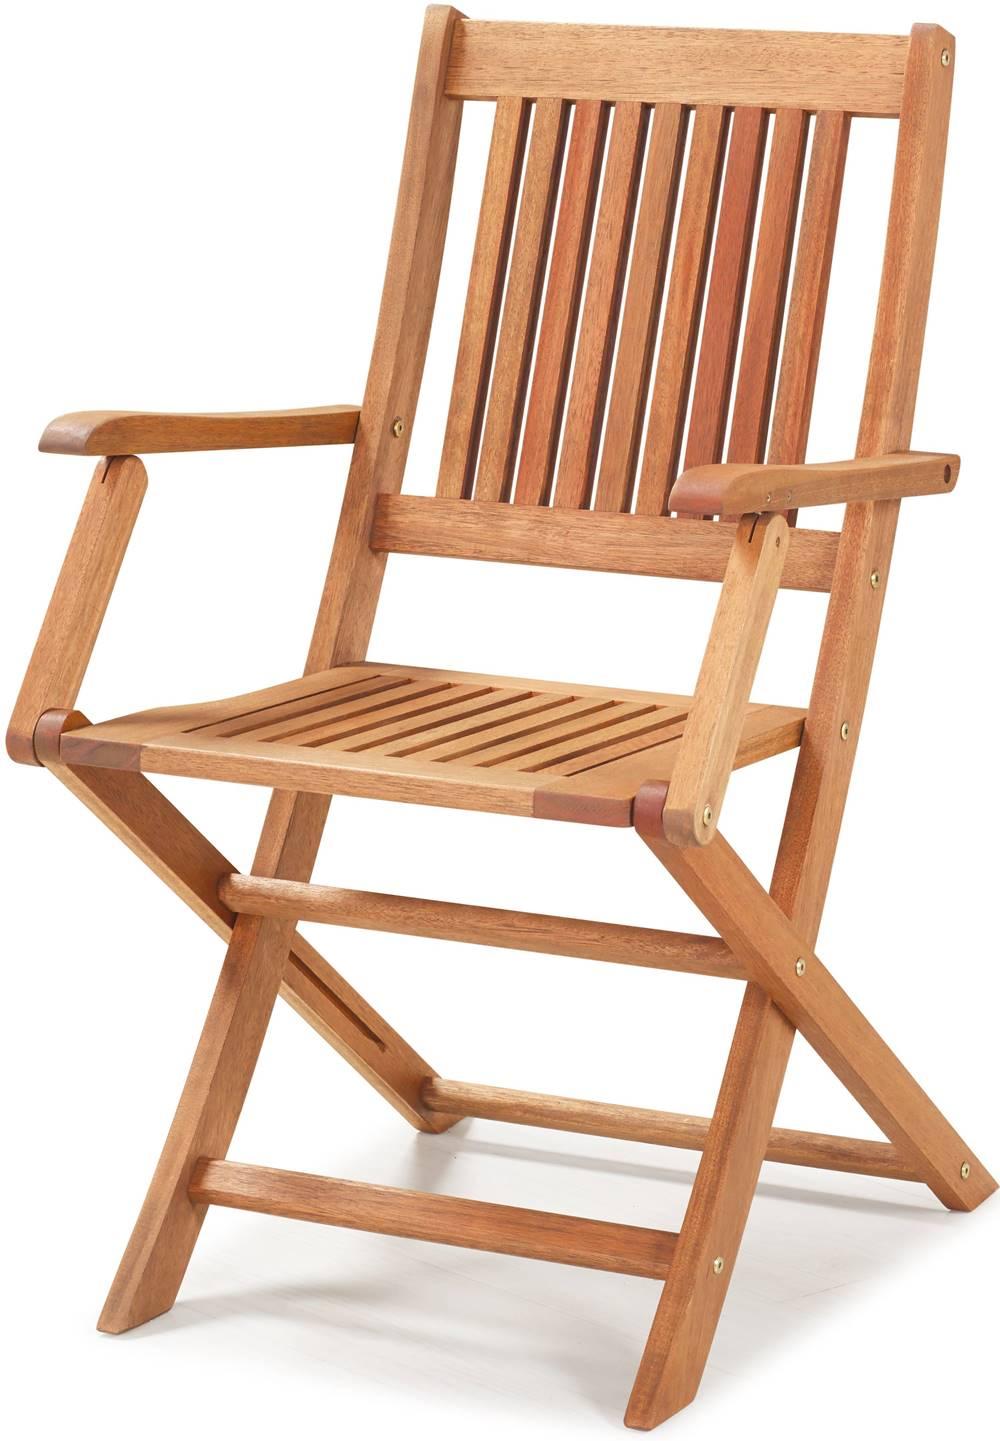 Cadeira Dobravel Primavera Com Bracos Stain Jatoba - 34807